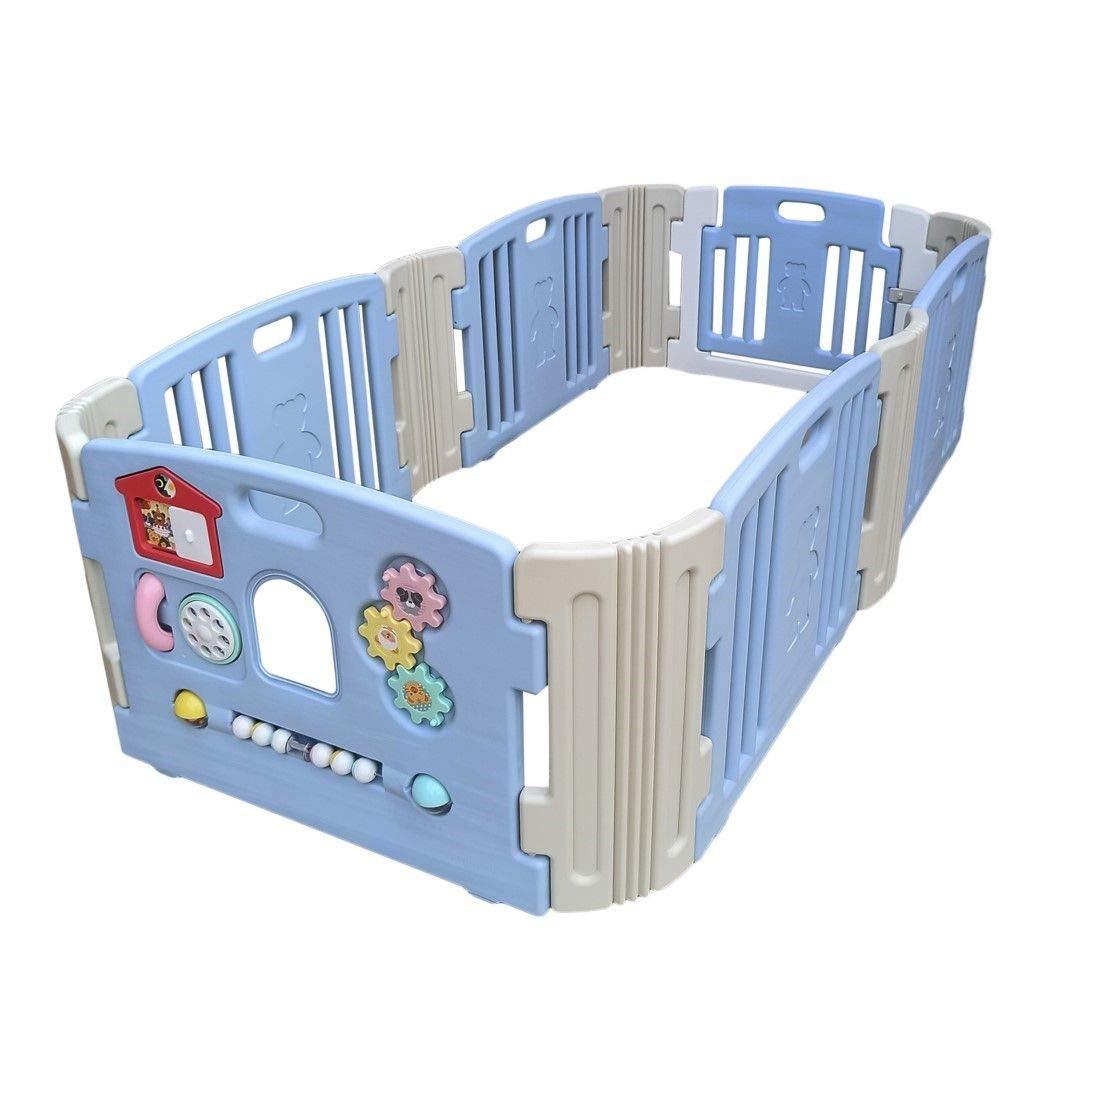 Babycenterindia Baby Room (Light Blue -Grey, with 2 Extension) (B07TXJ1X8M) Amazon Price History, Amazon Price Tracker